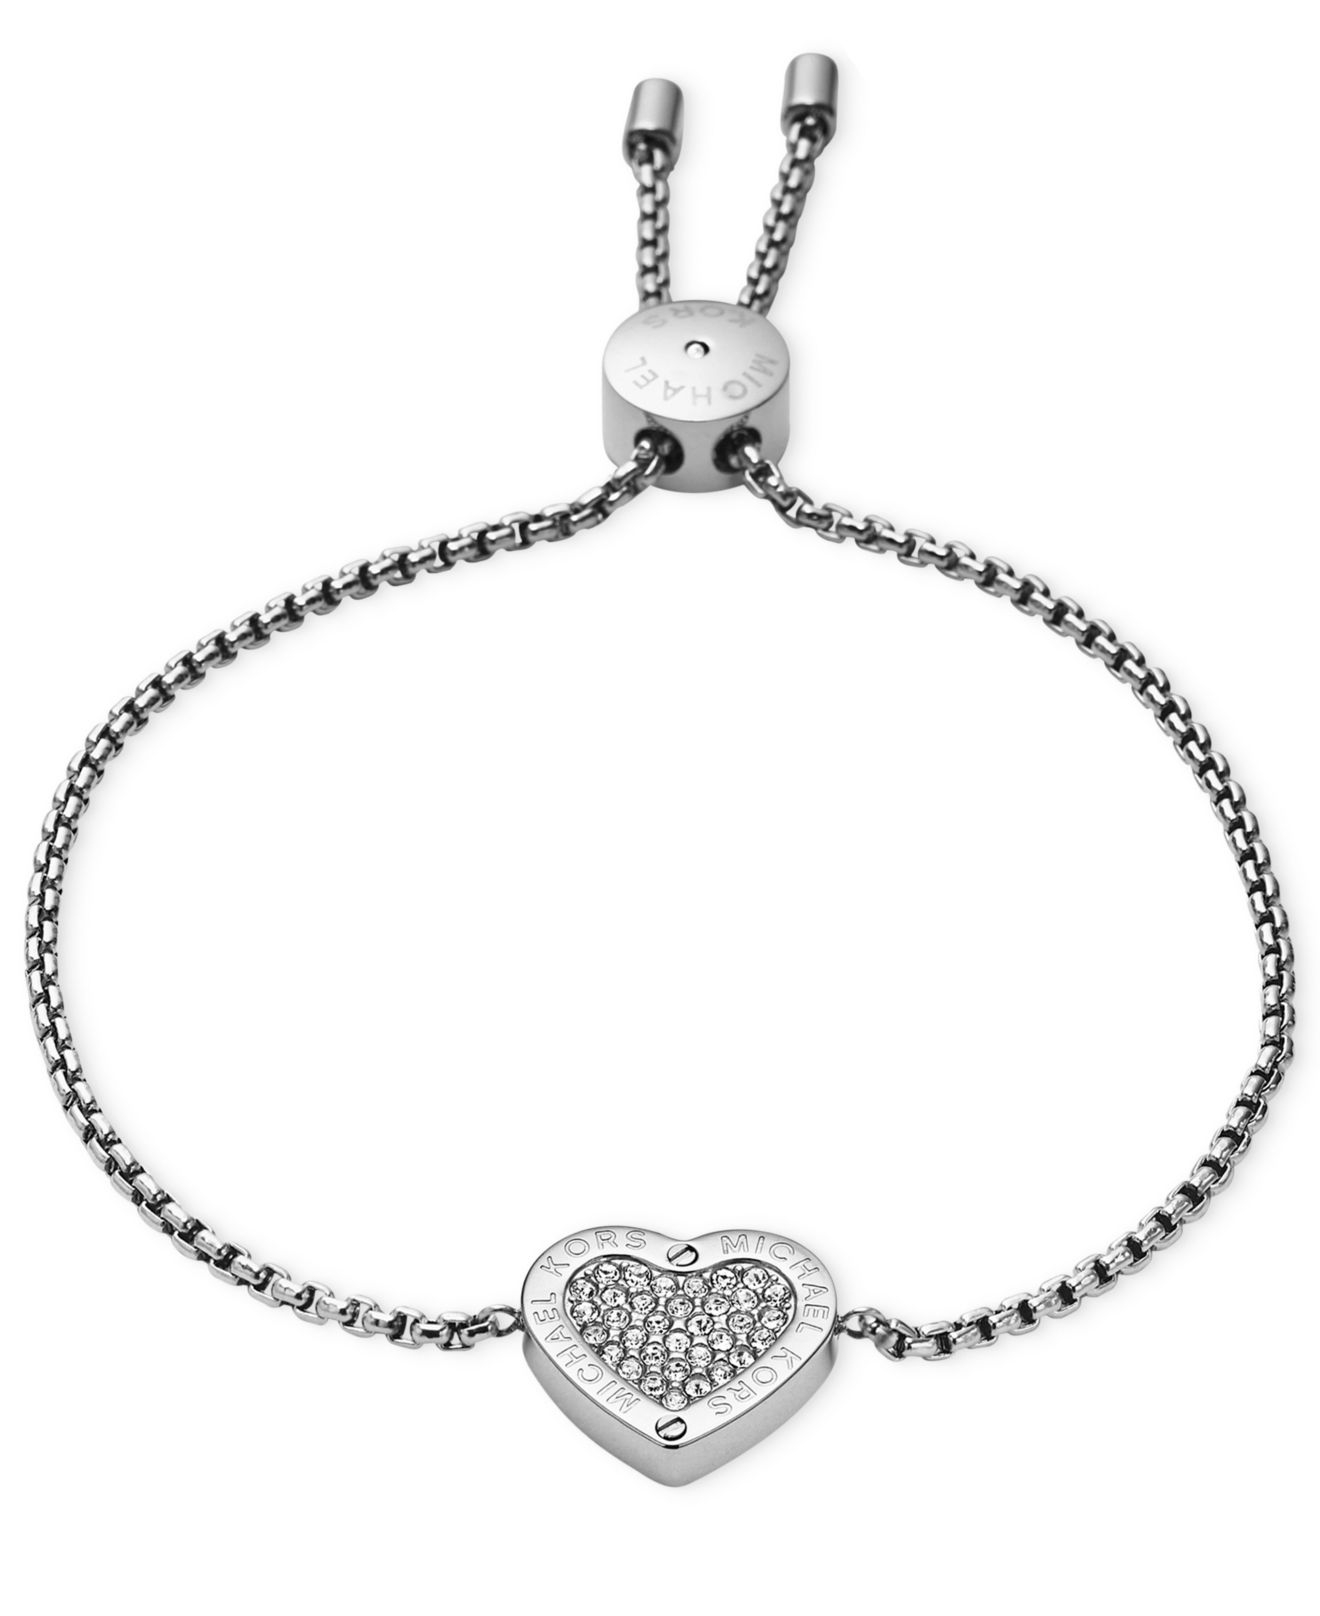 db8a9d2134ff3 Lyst - Michael Kors Gold-tone Crystal Heart Slider Bracelet in Metallic